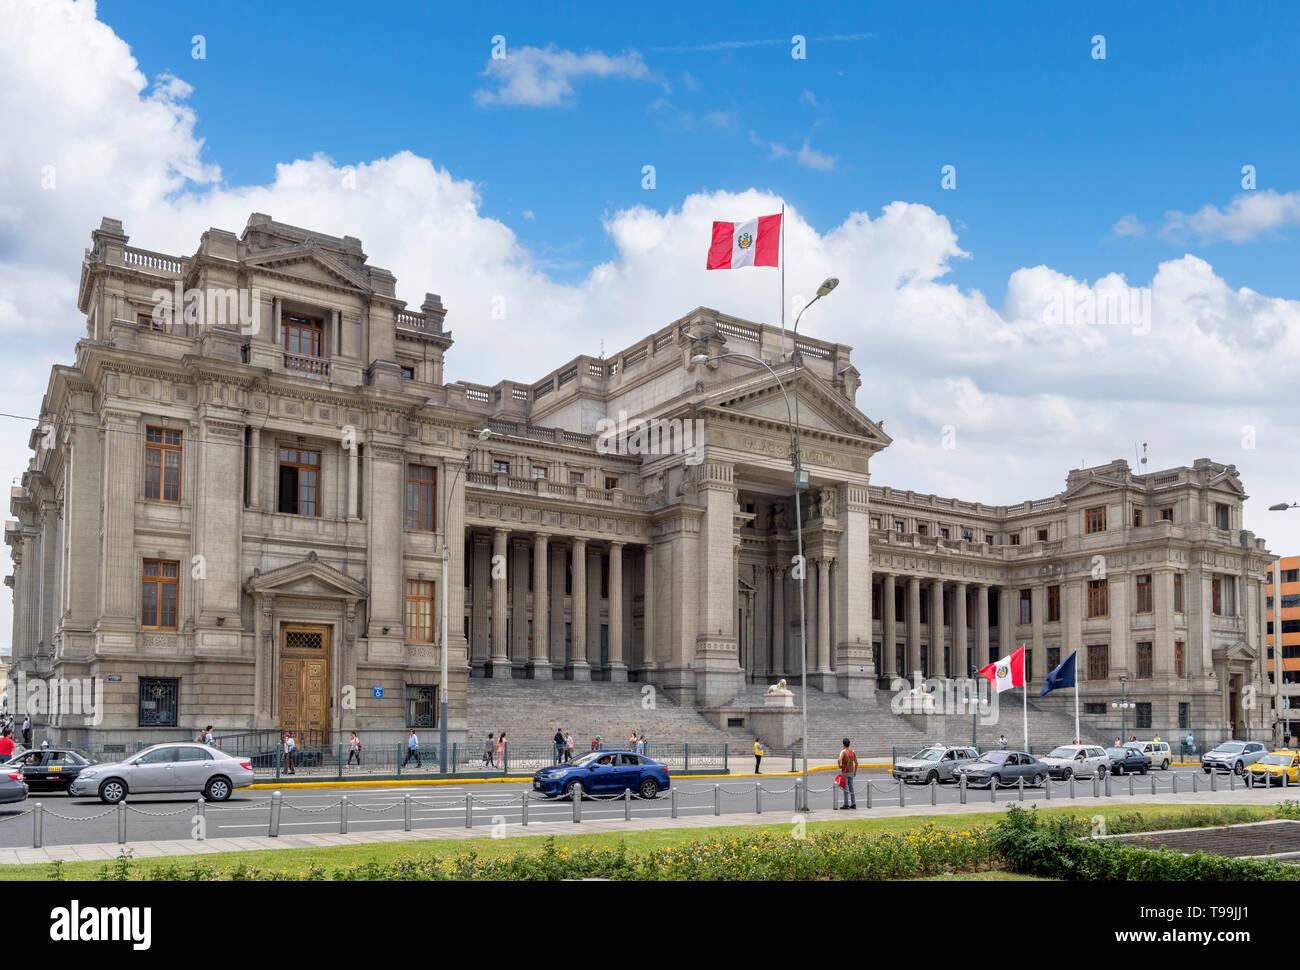 Palace of Justice (Palacio de Justicia), Paseo de la Republica, Lima, Peru, South America - Stock Image